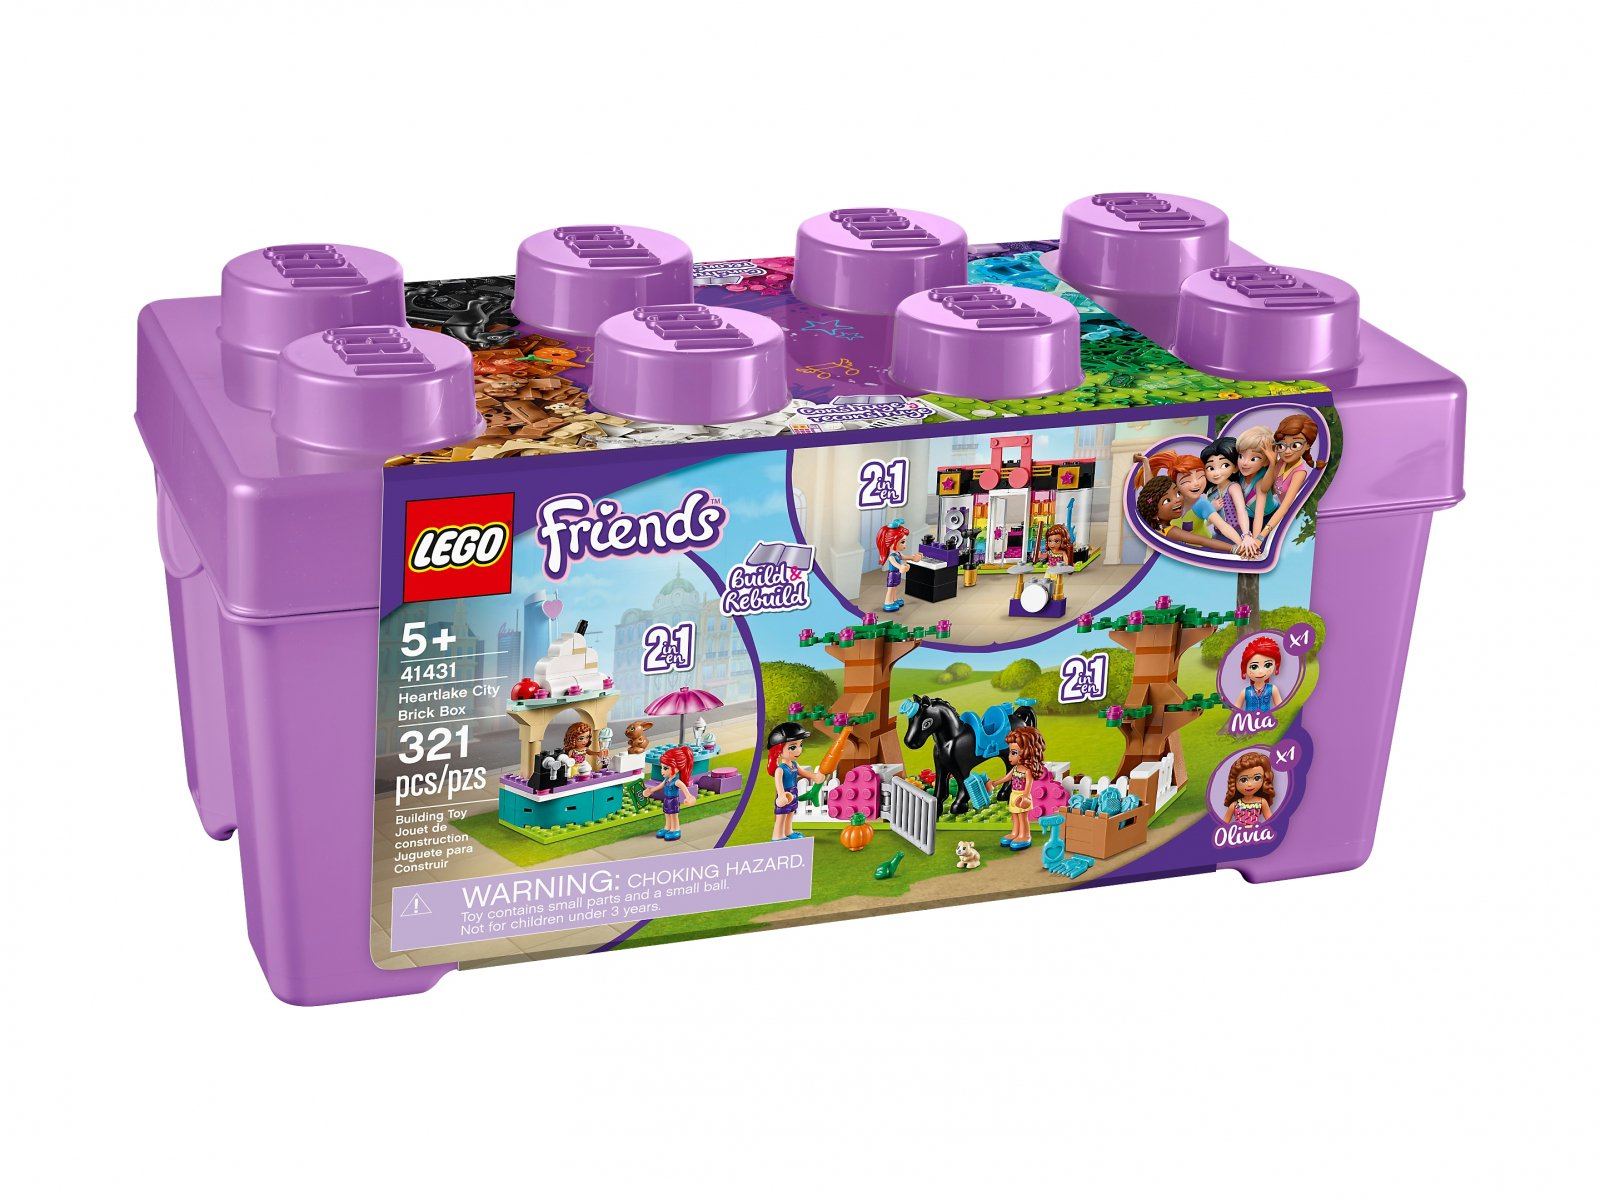 LEGO Friends 41431 Zestaw klocków Heartlake City